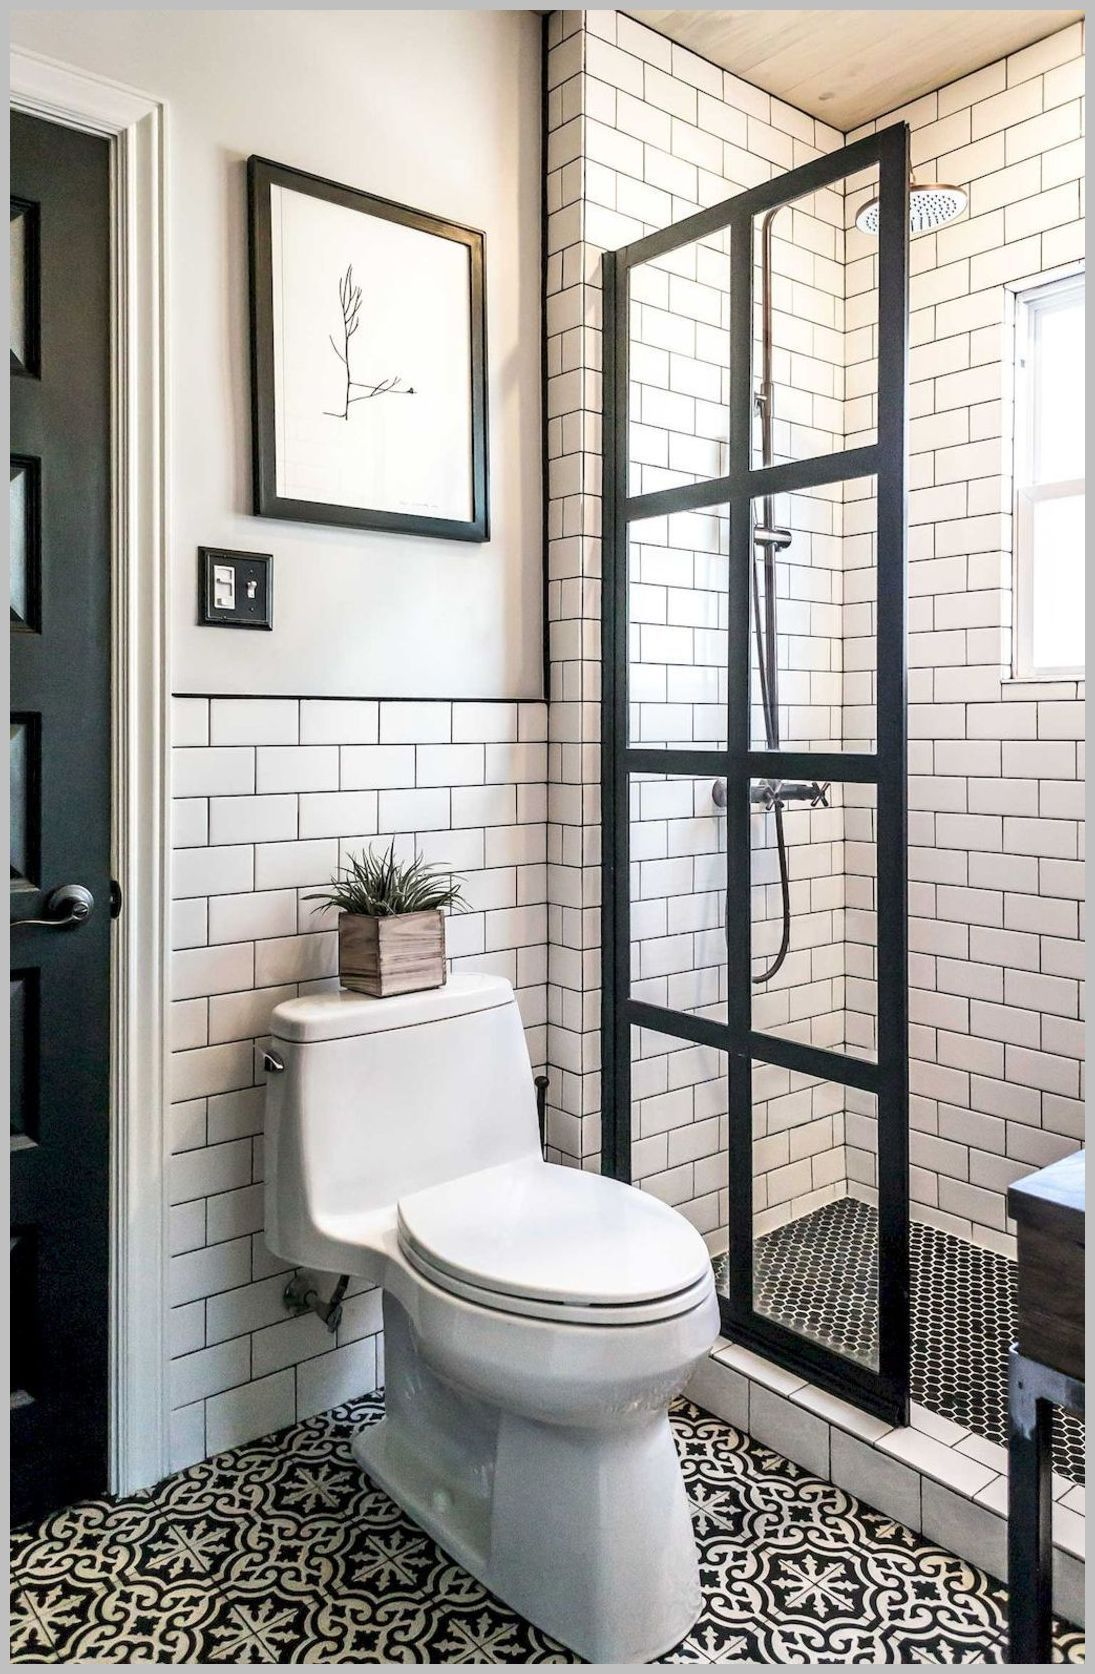 Bathroom Decorating Ideas ] Small Bathroom Decor - Three Easy Tips ...